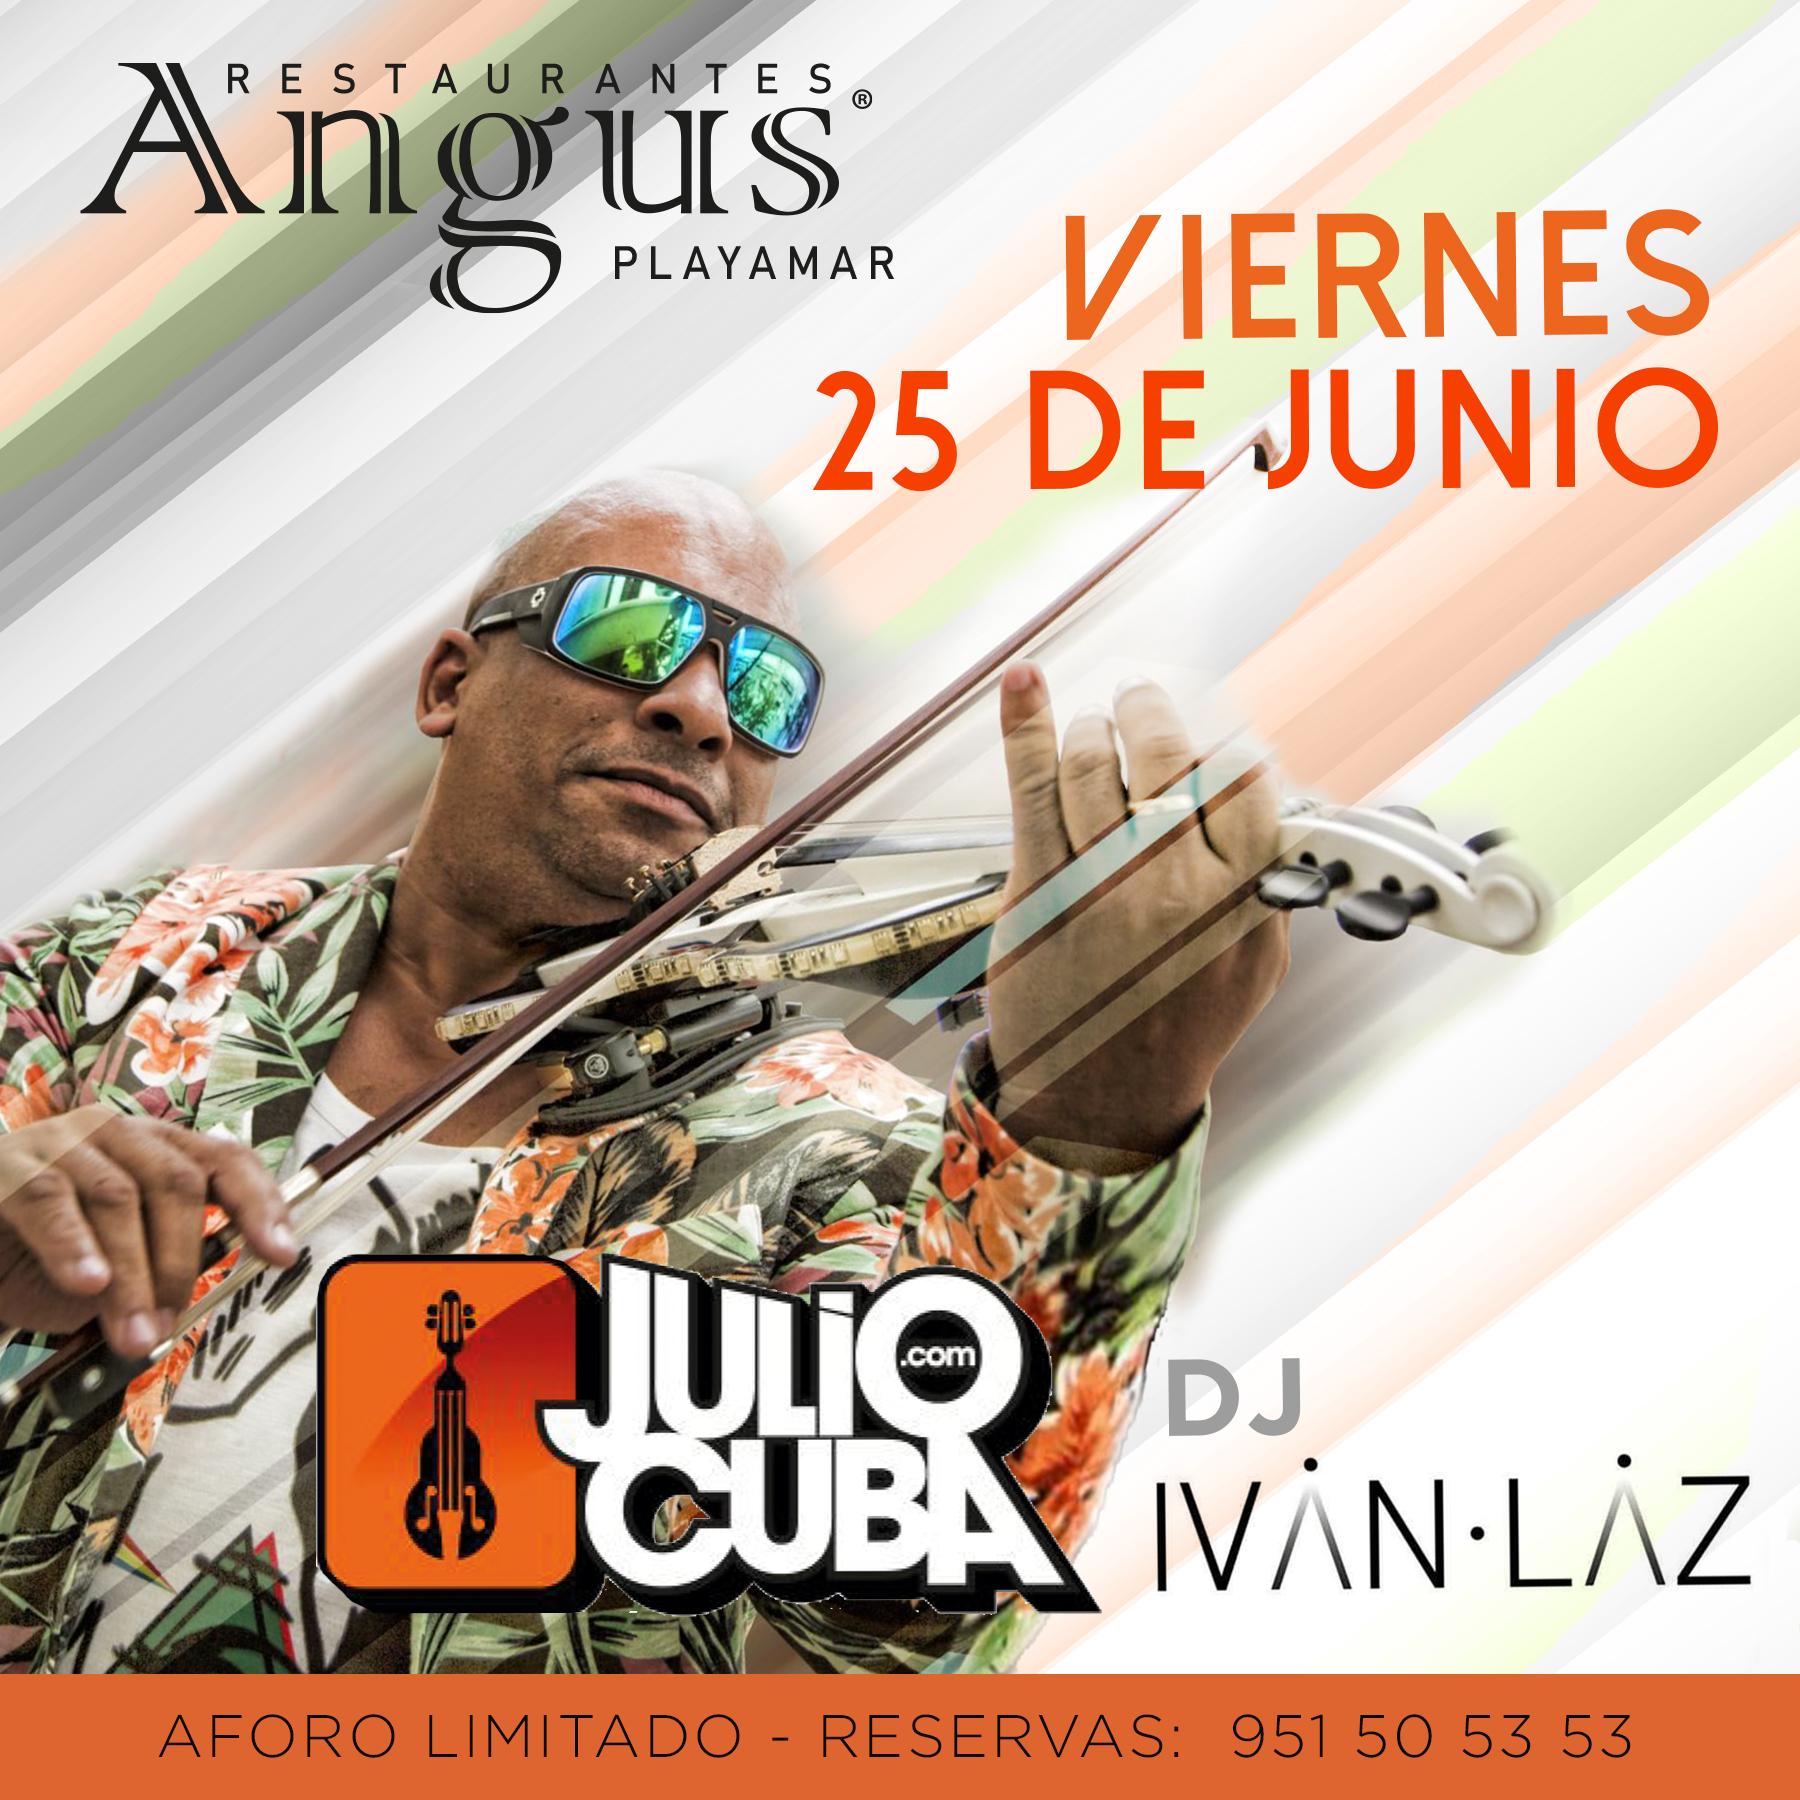 JULIO CUBA ANGUS PLAYAMAR